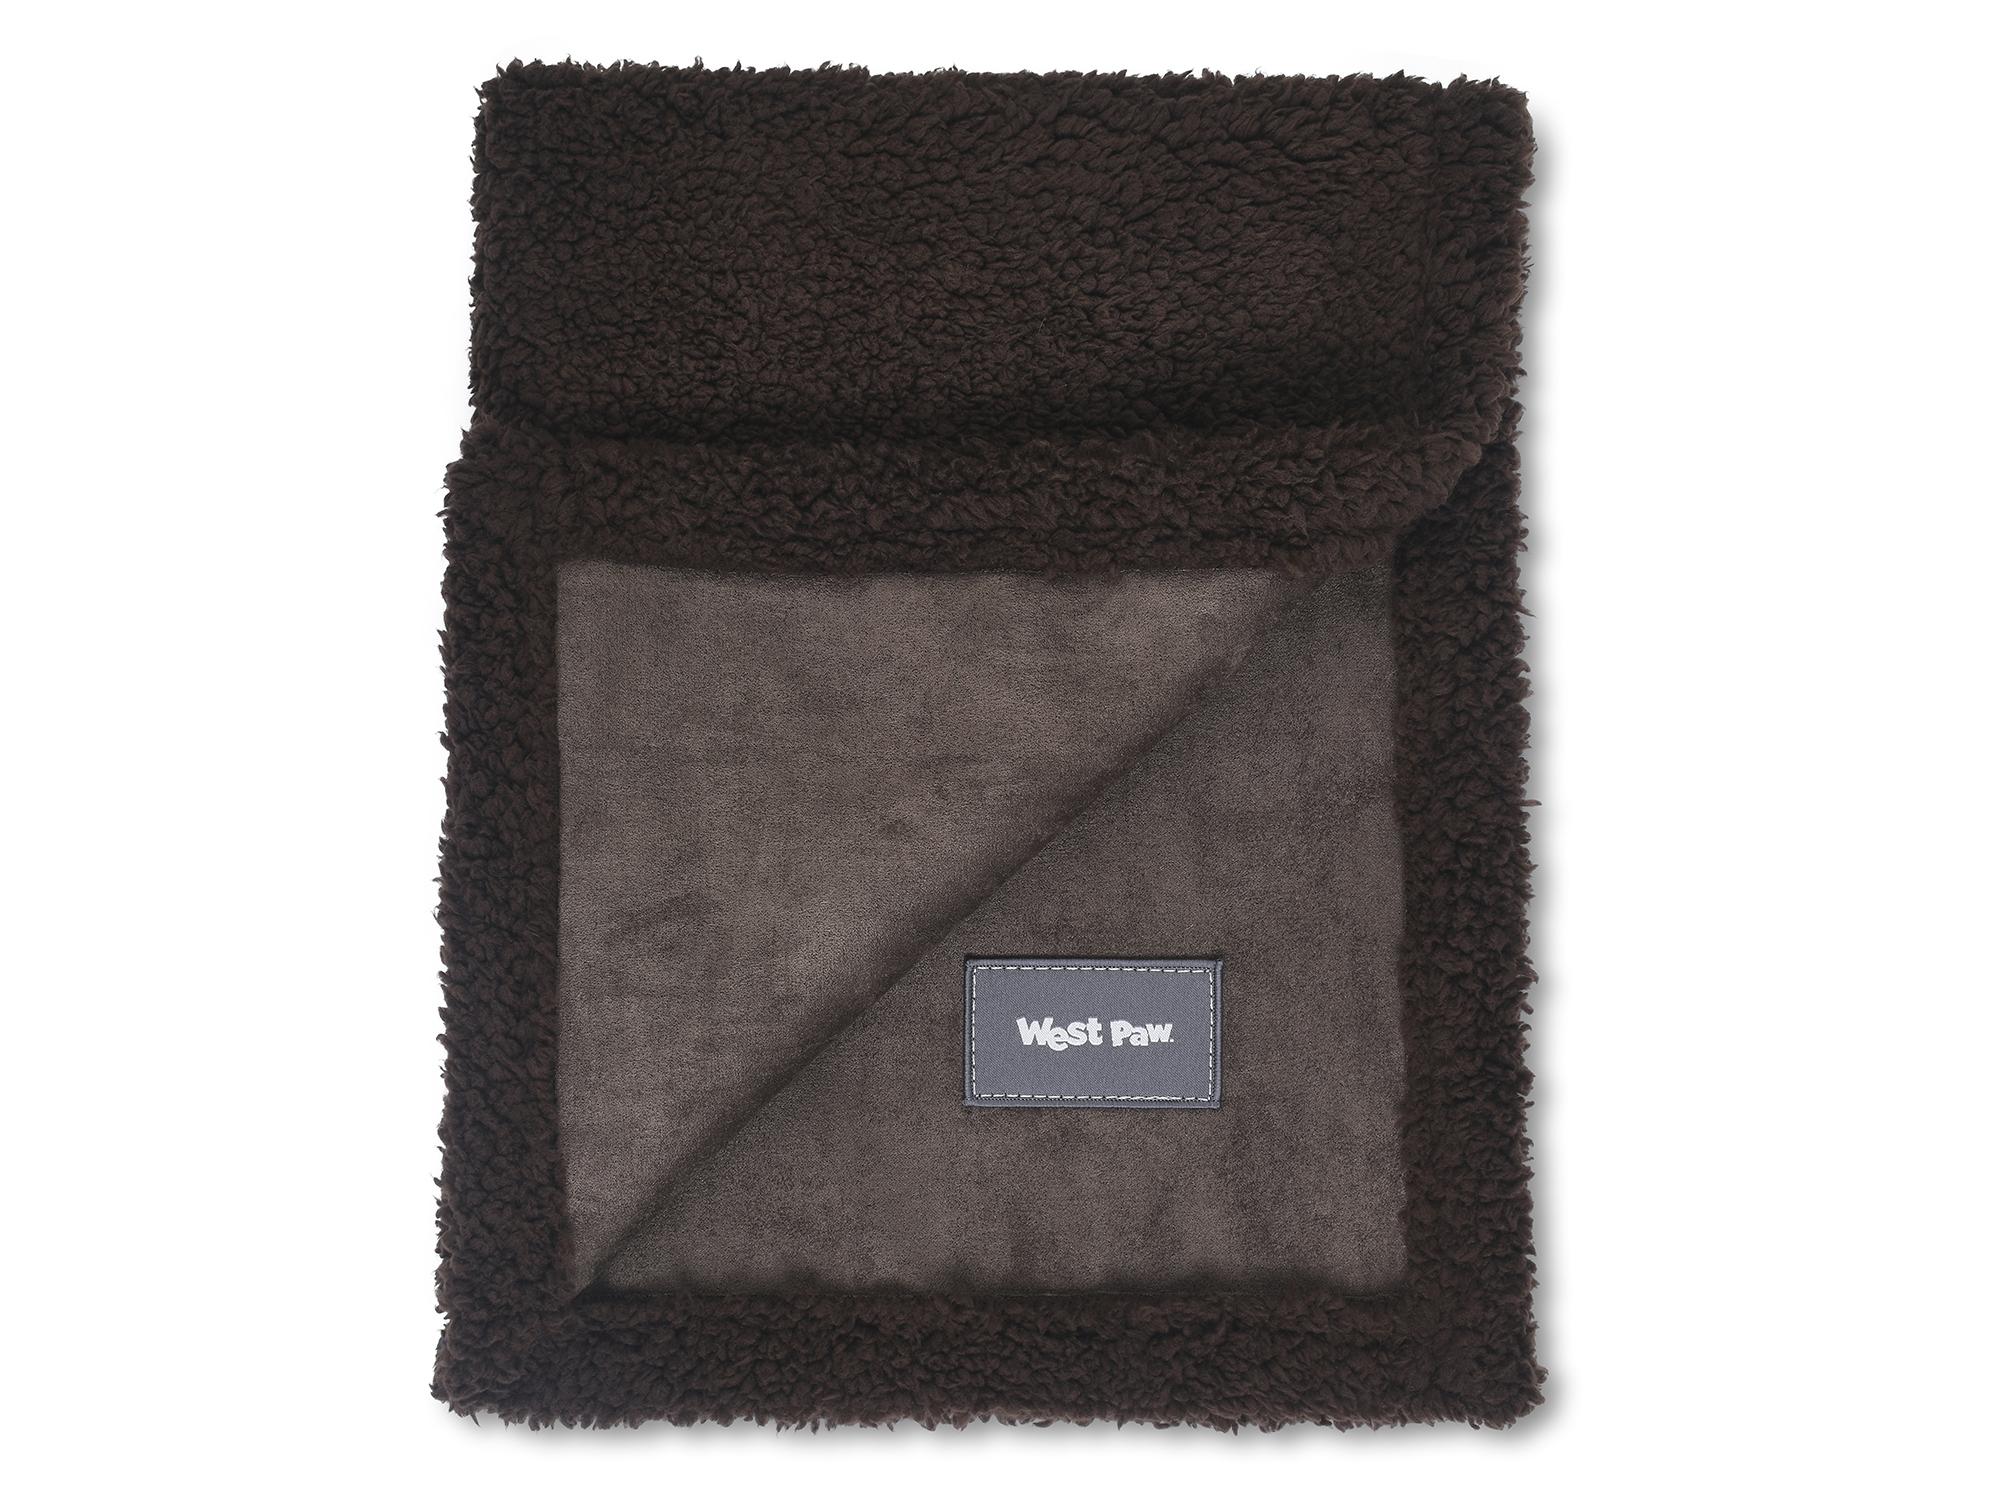 wp-dog-blanket-big-sky-chocolate-1